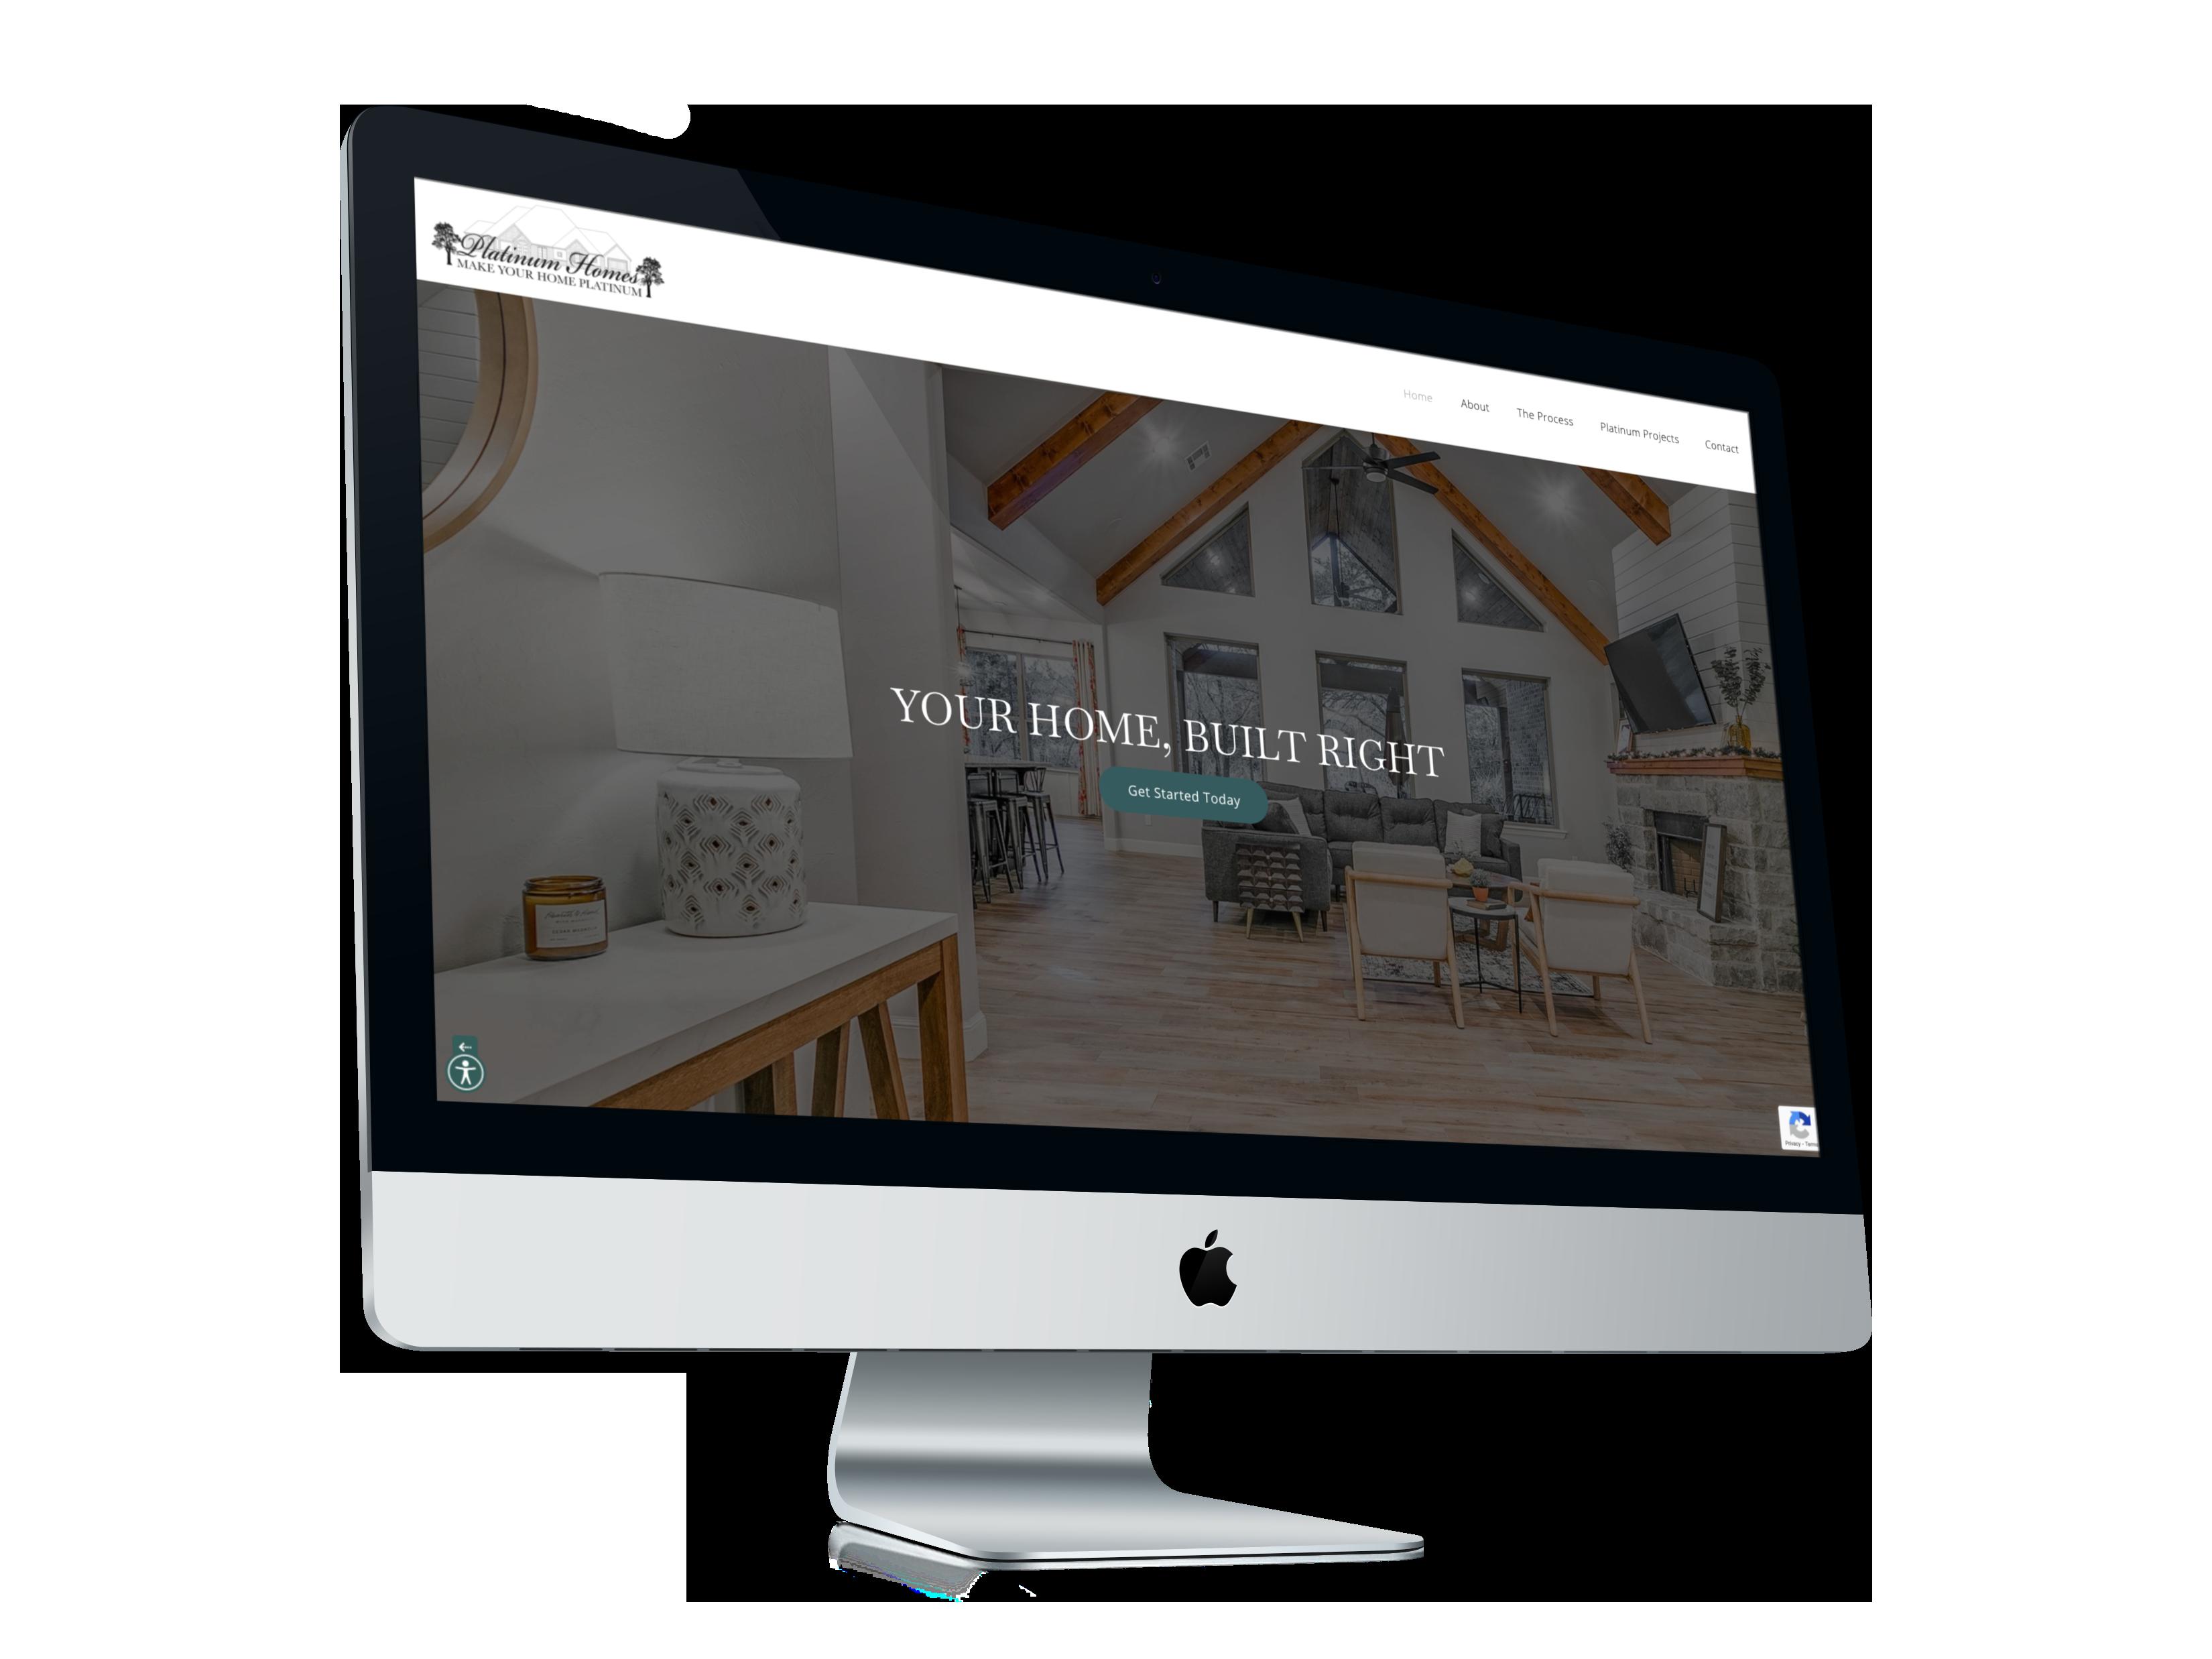 platinum homes homepage on computer